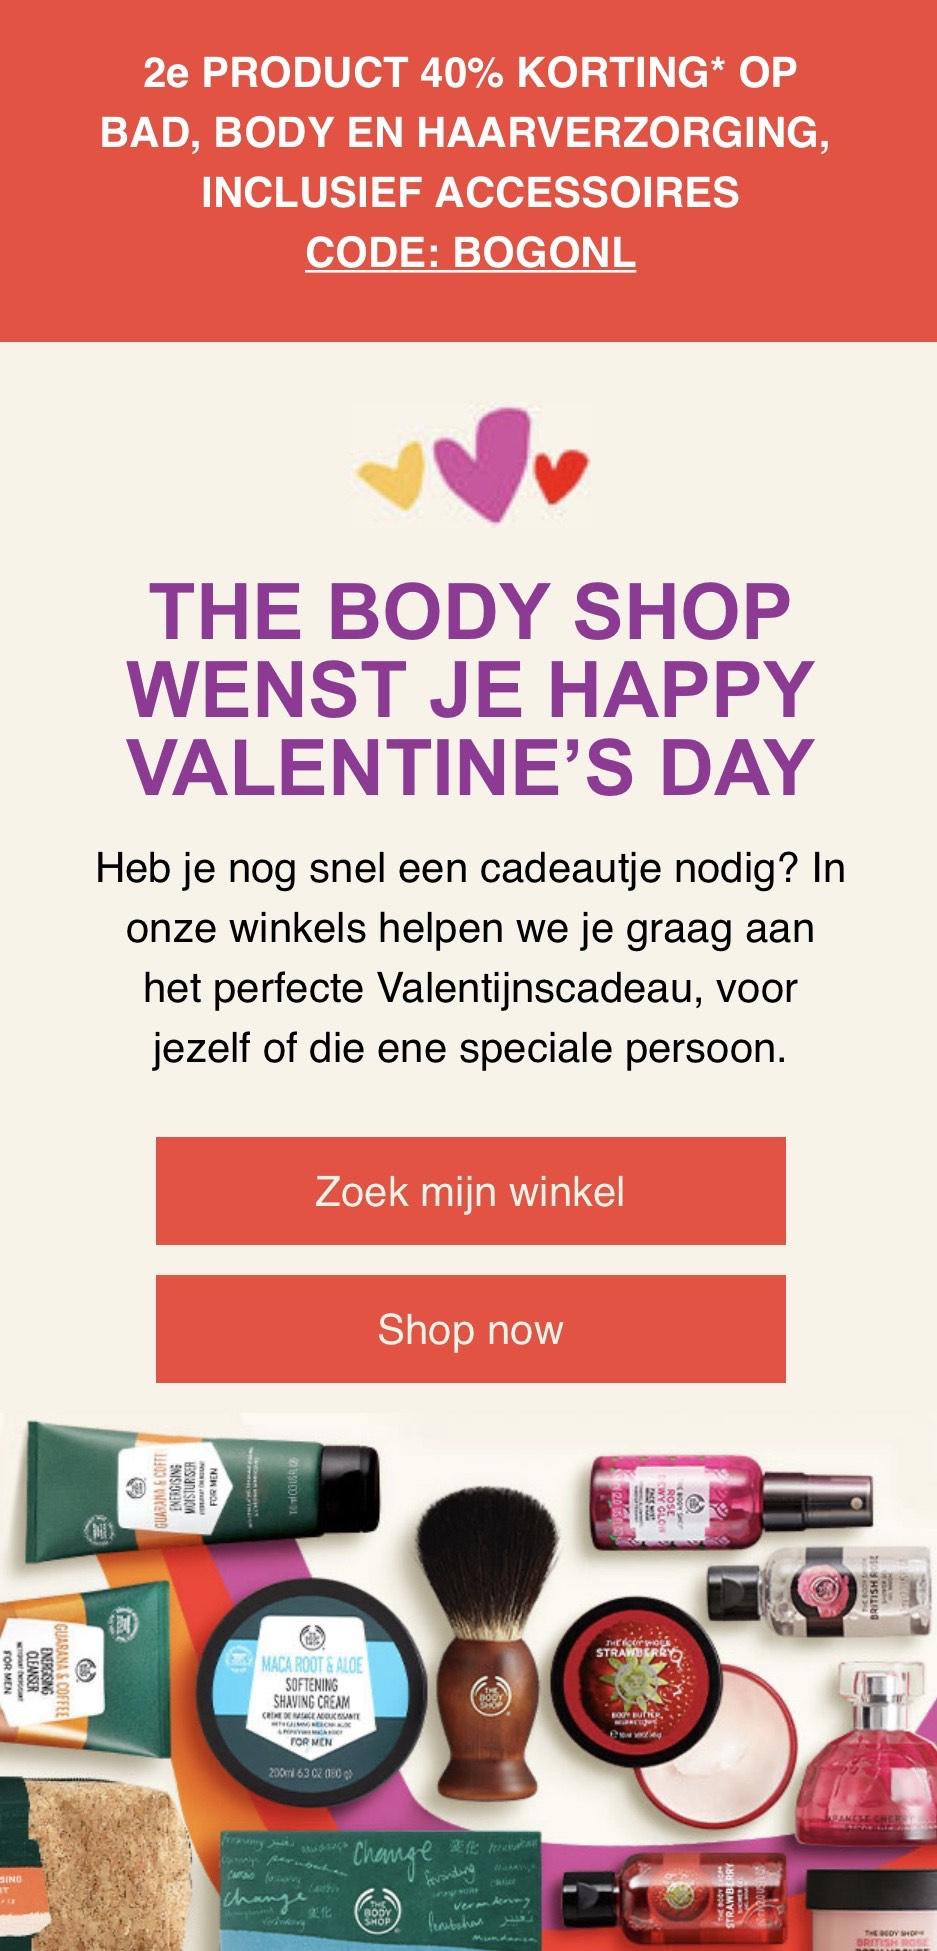 2e product : 40% korting op bodycare bij Body Shop